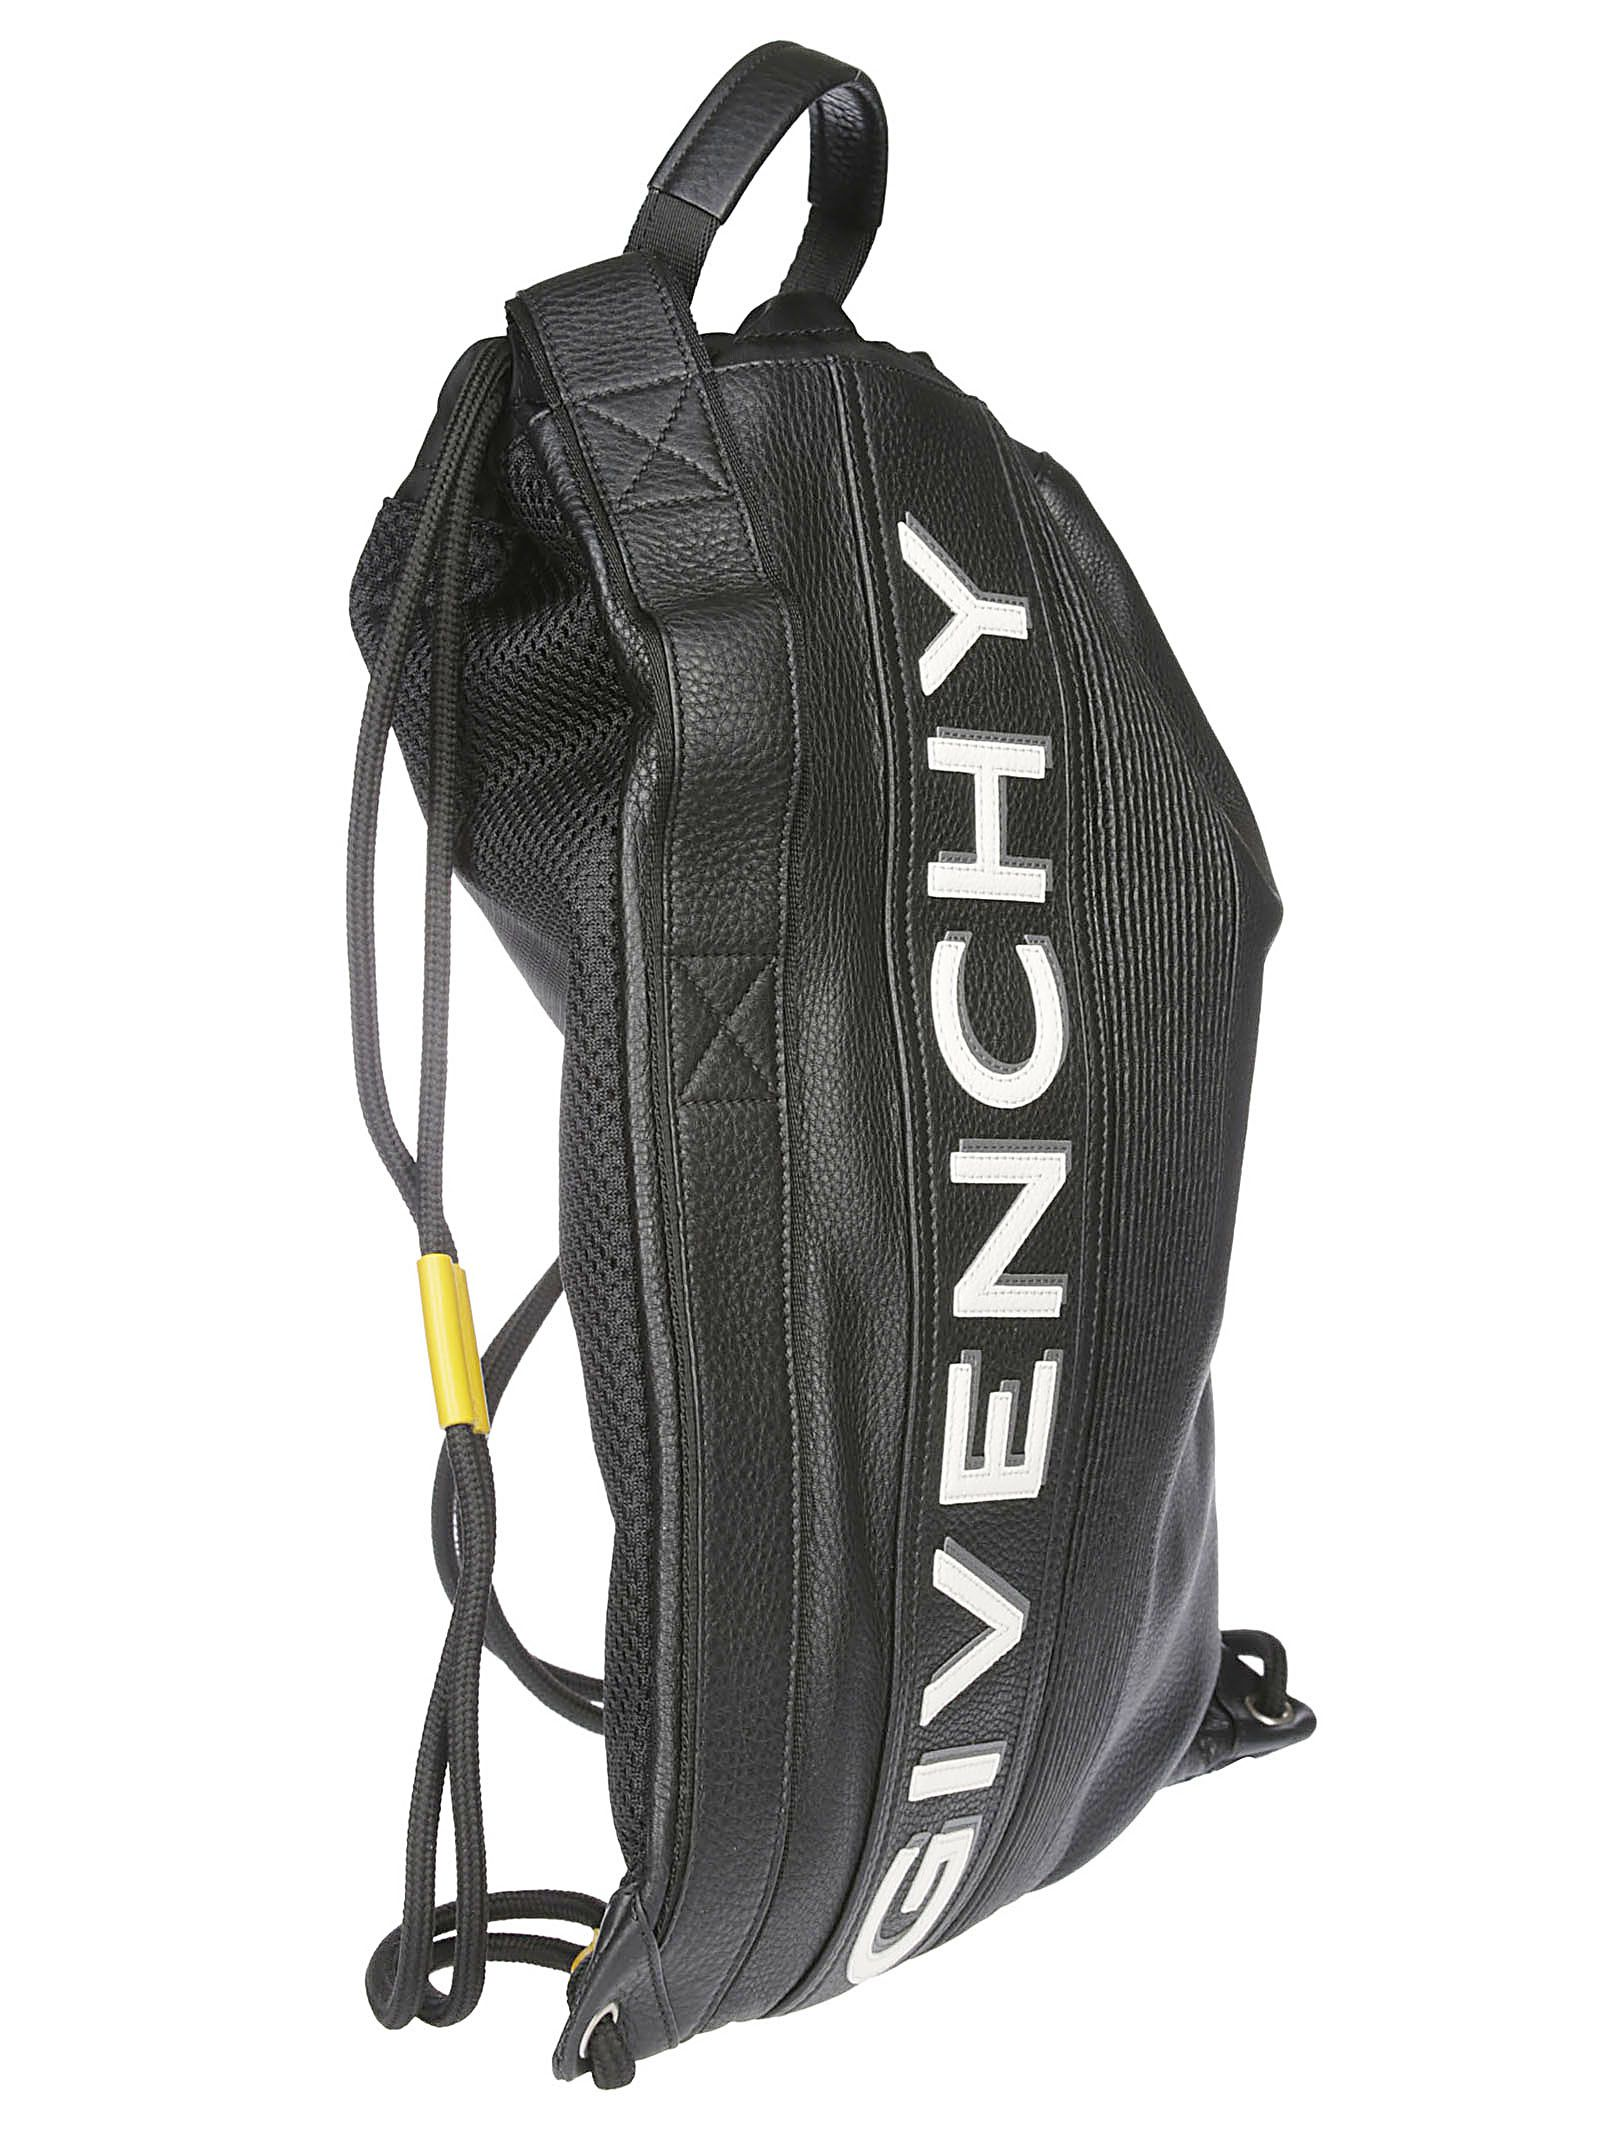 58c33338437d16 Givenchy Givenchy Mc3 Drawstring Backpack - Black - 10833998 | italist